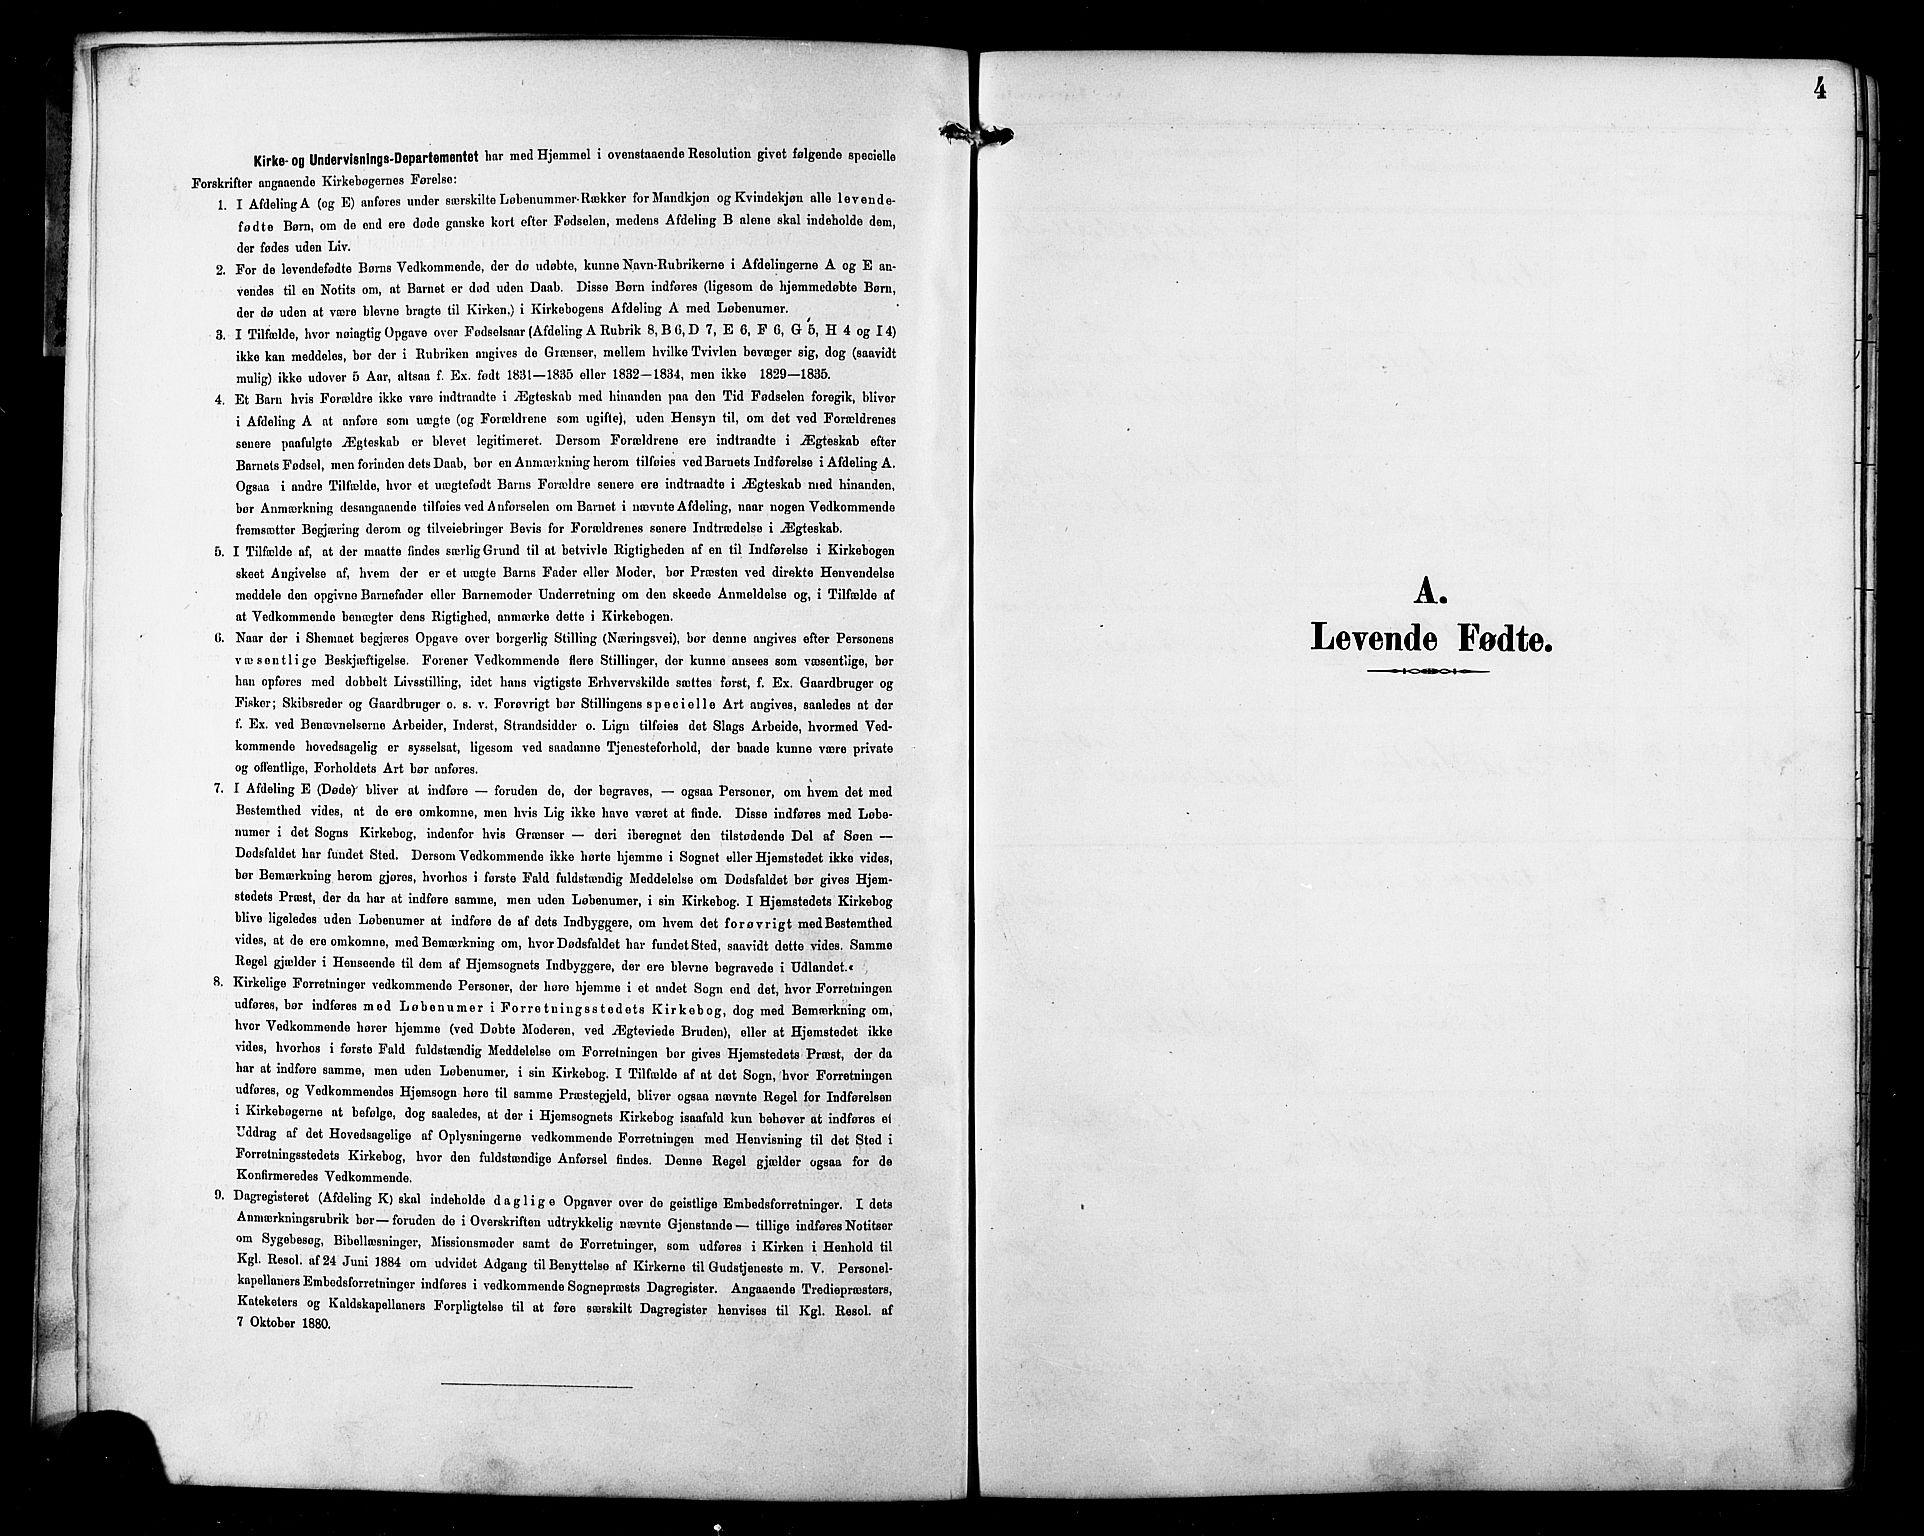 SATØ, Skjervøy sokneprestkontor, H/Ha/Hab/L0016klokker: Klokkerbok nr. 16, 1891-1907, s. 4